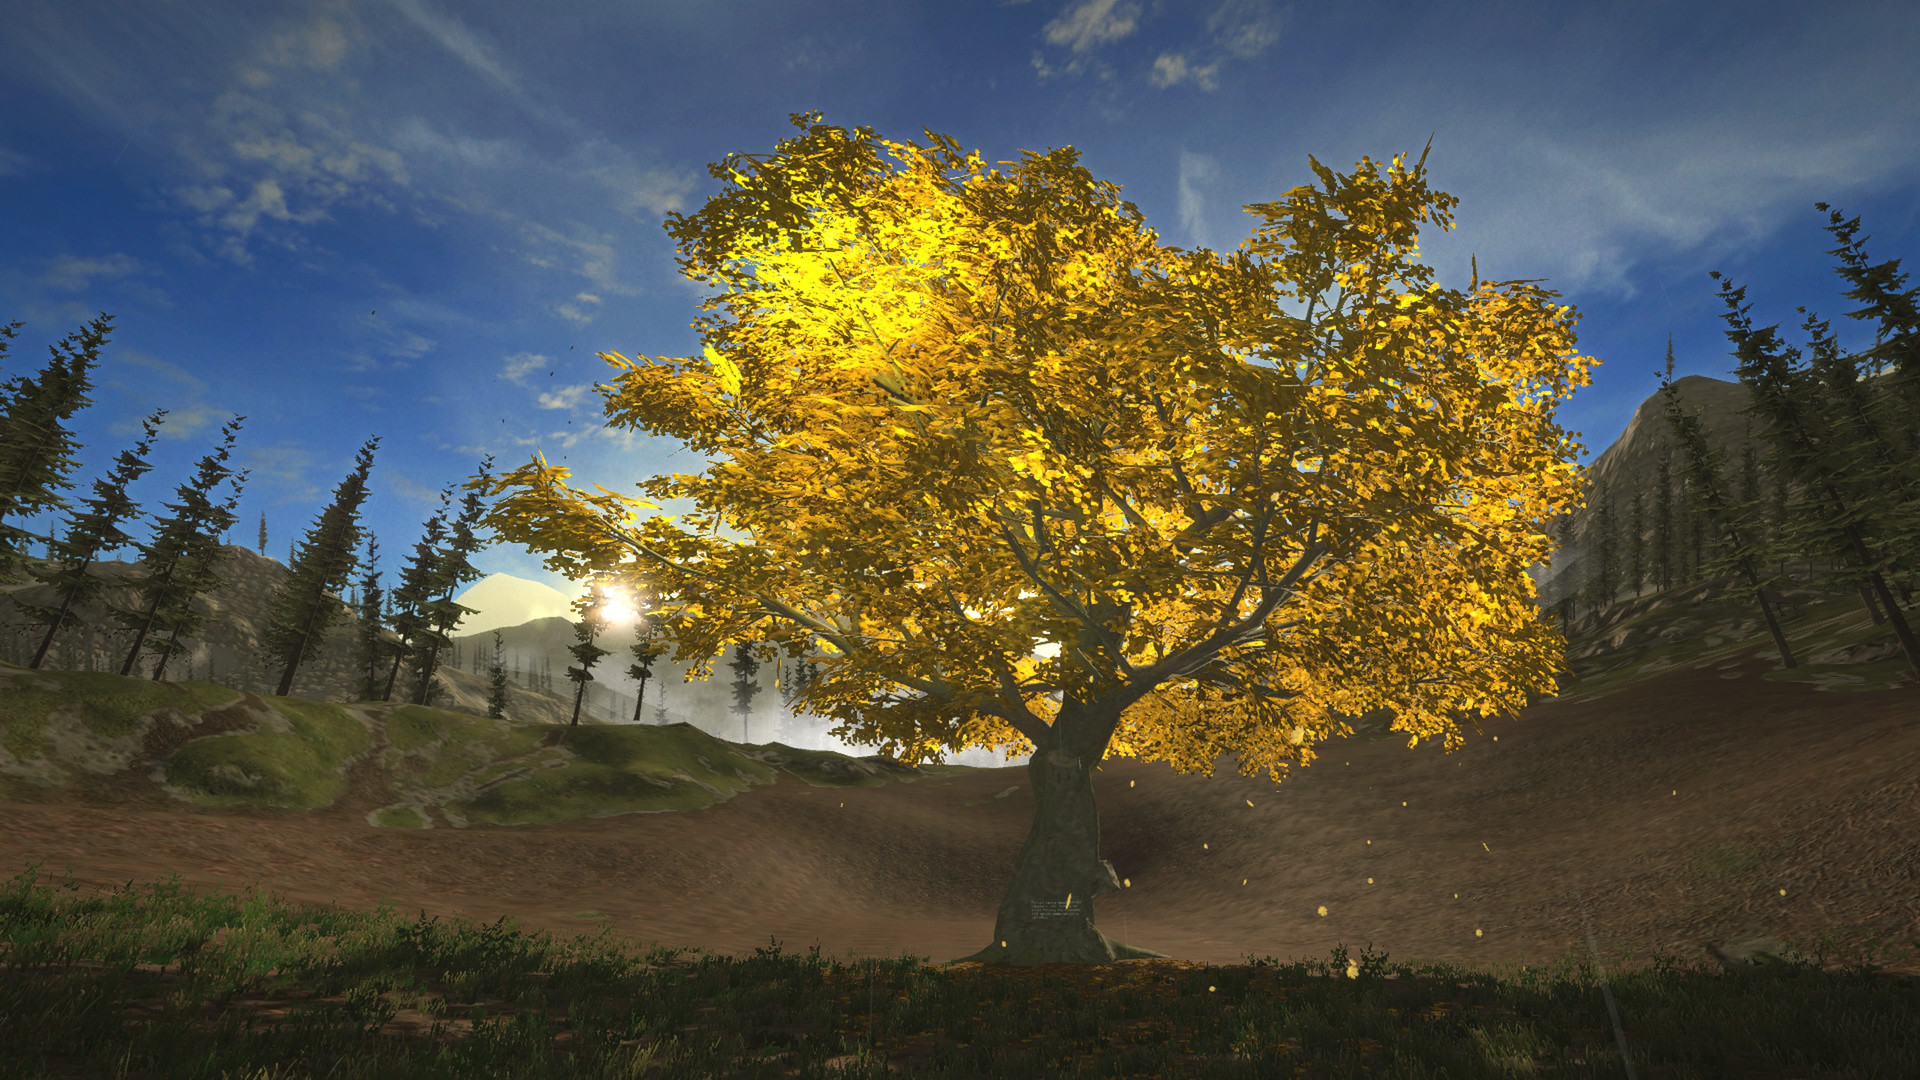 The First Tree_20200508044105.jpg